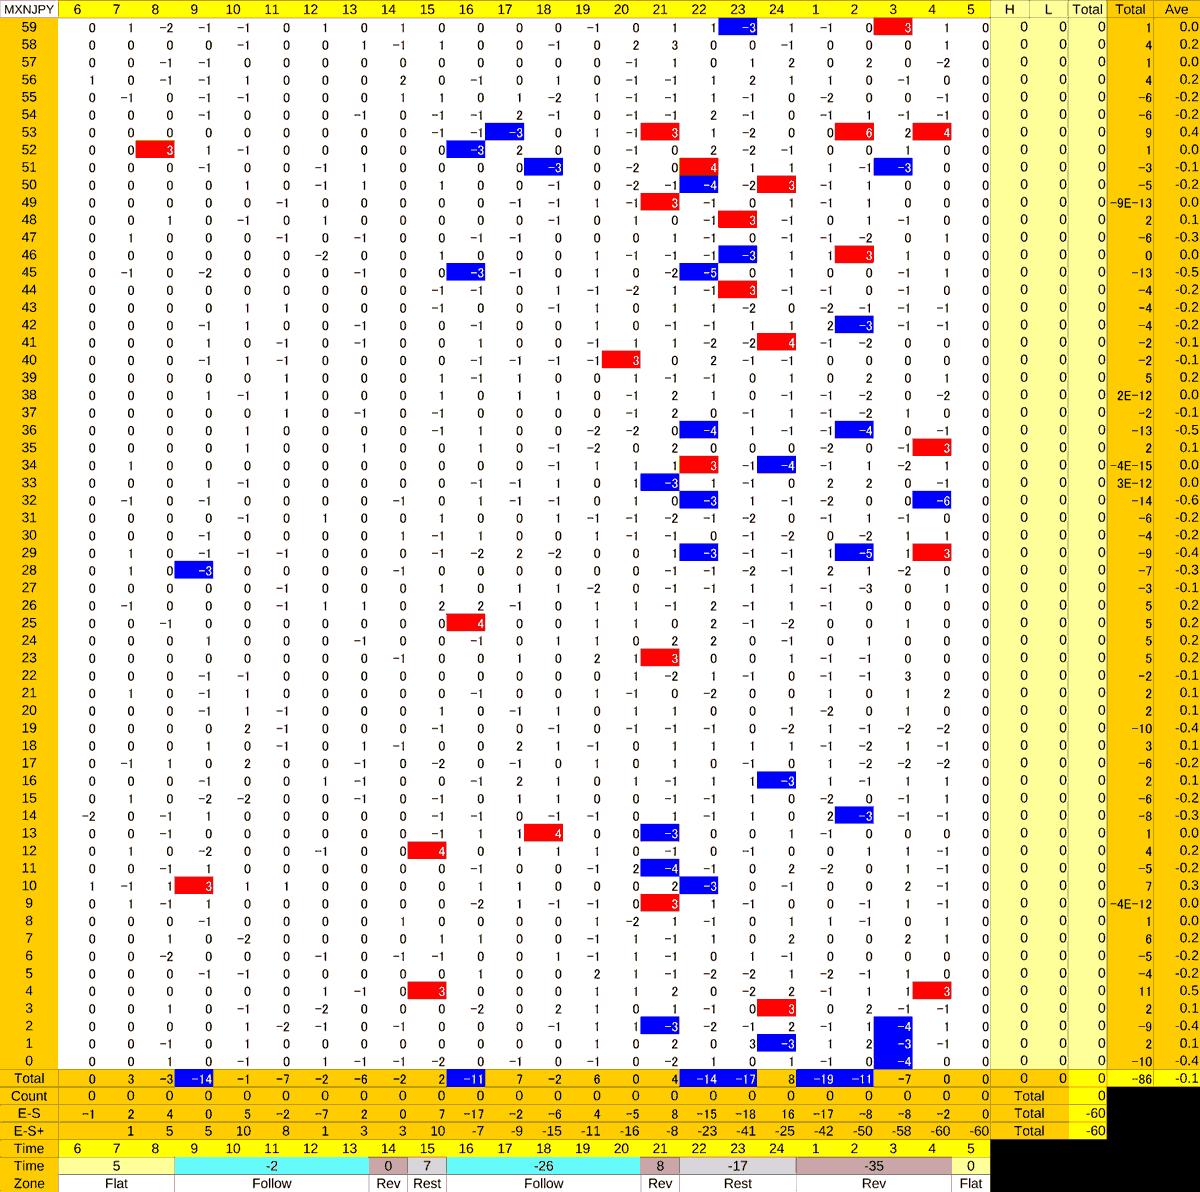 20200918_HS(3)MXNJPY